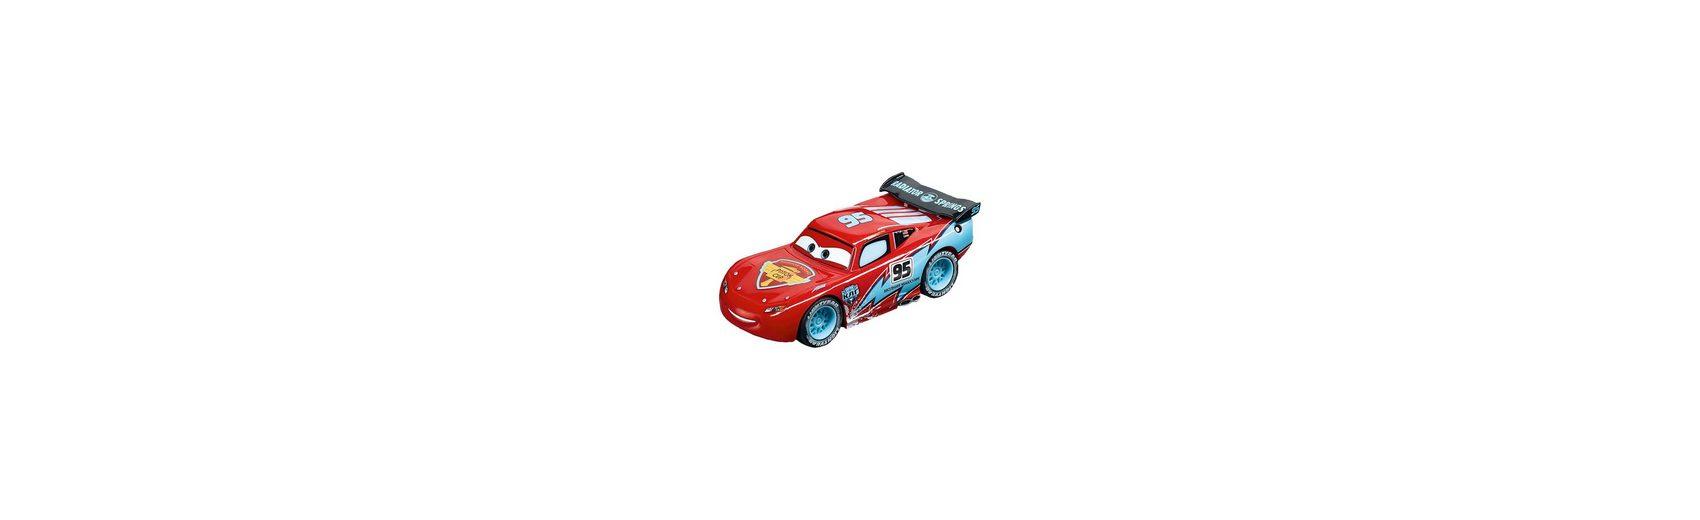 Carrera GO!!! 64023 Cars ICE Lightning McQueen